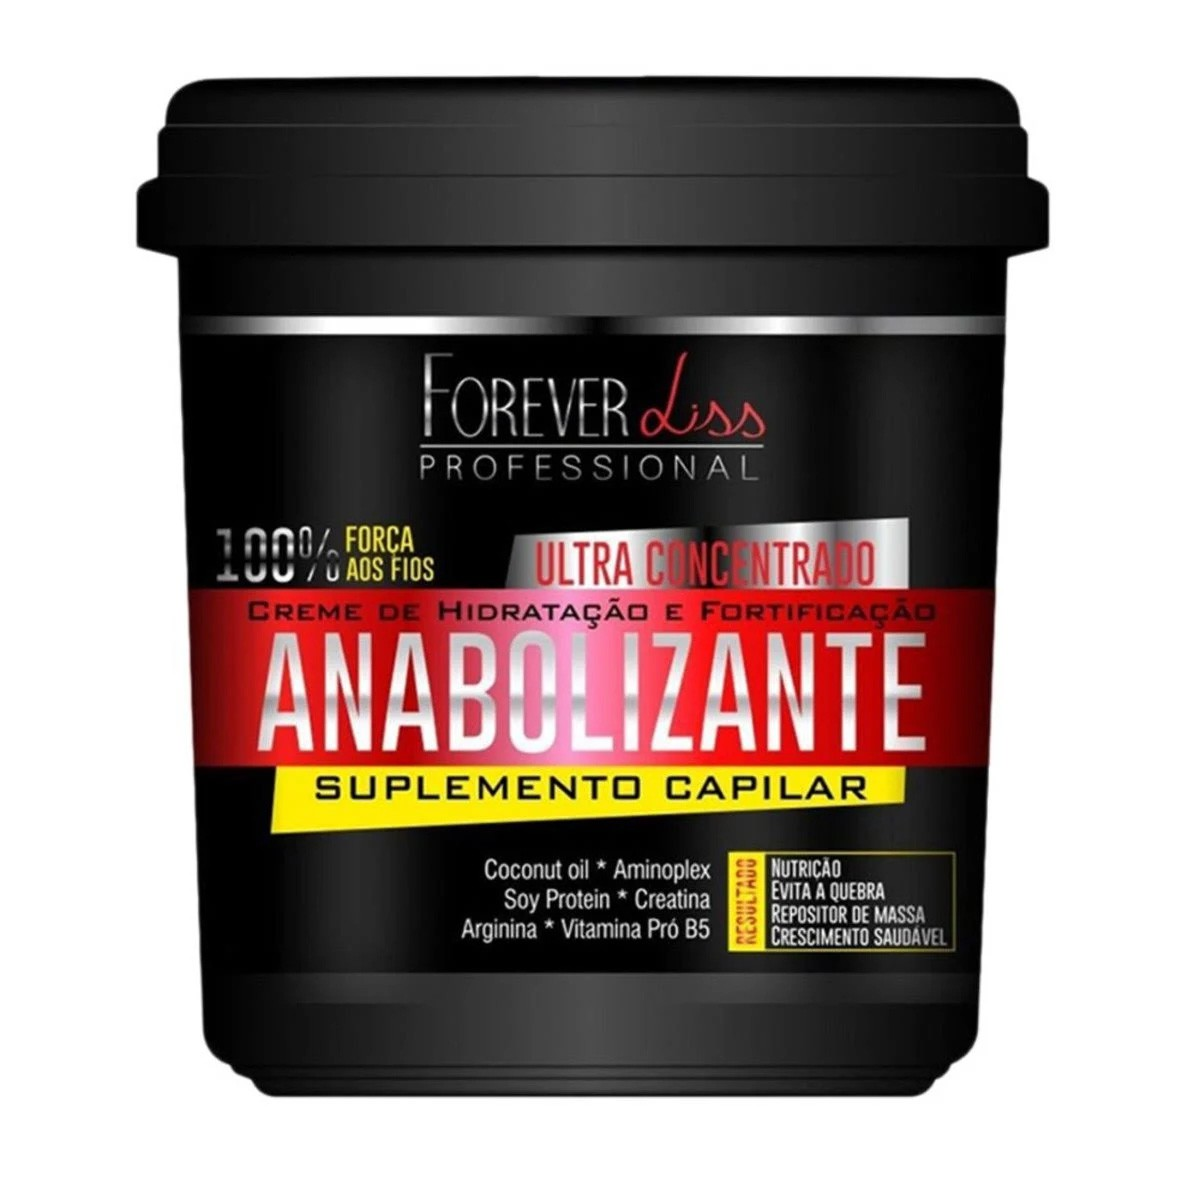 Forever Liss Anabolizante Kit Shampoo + Máscara 240g